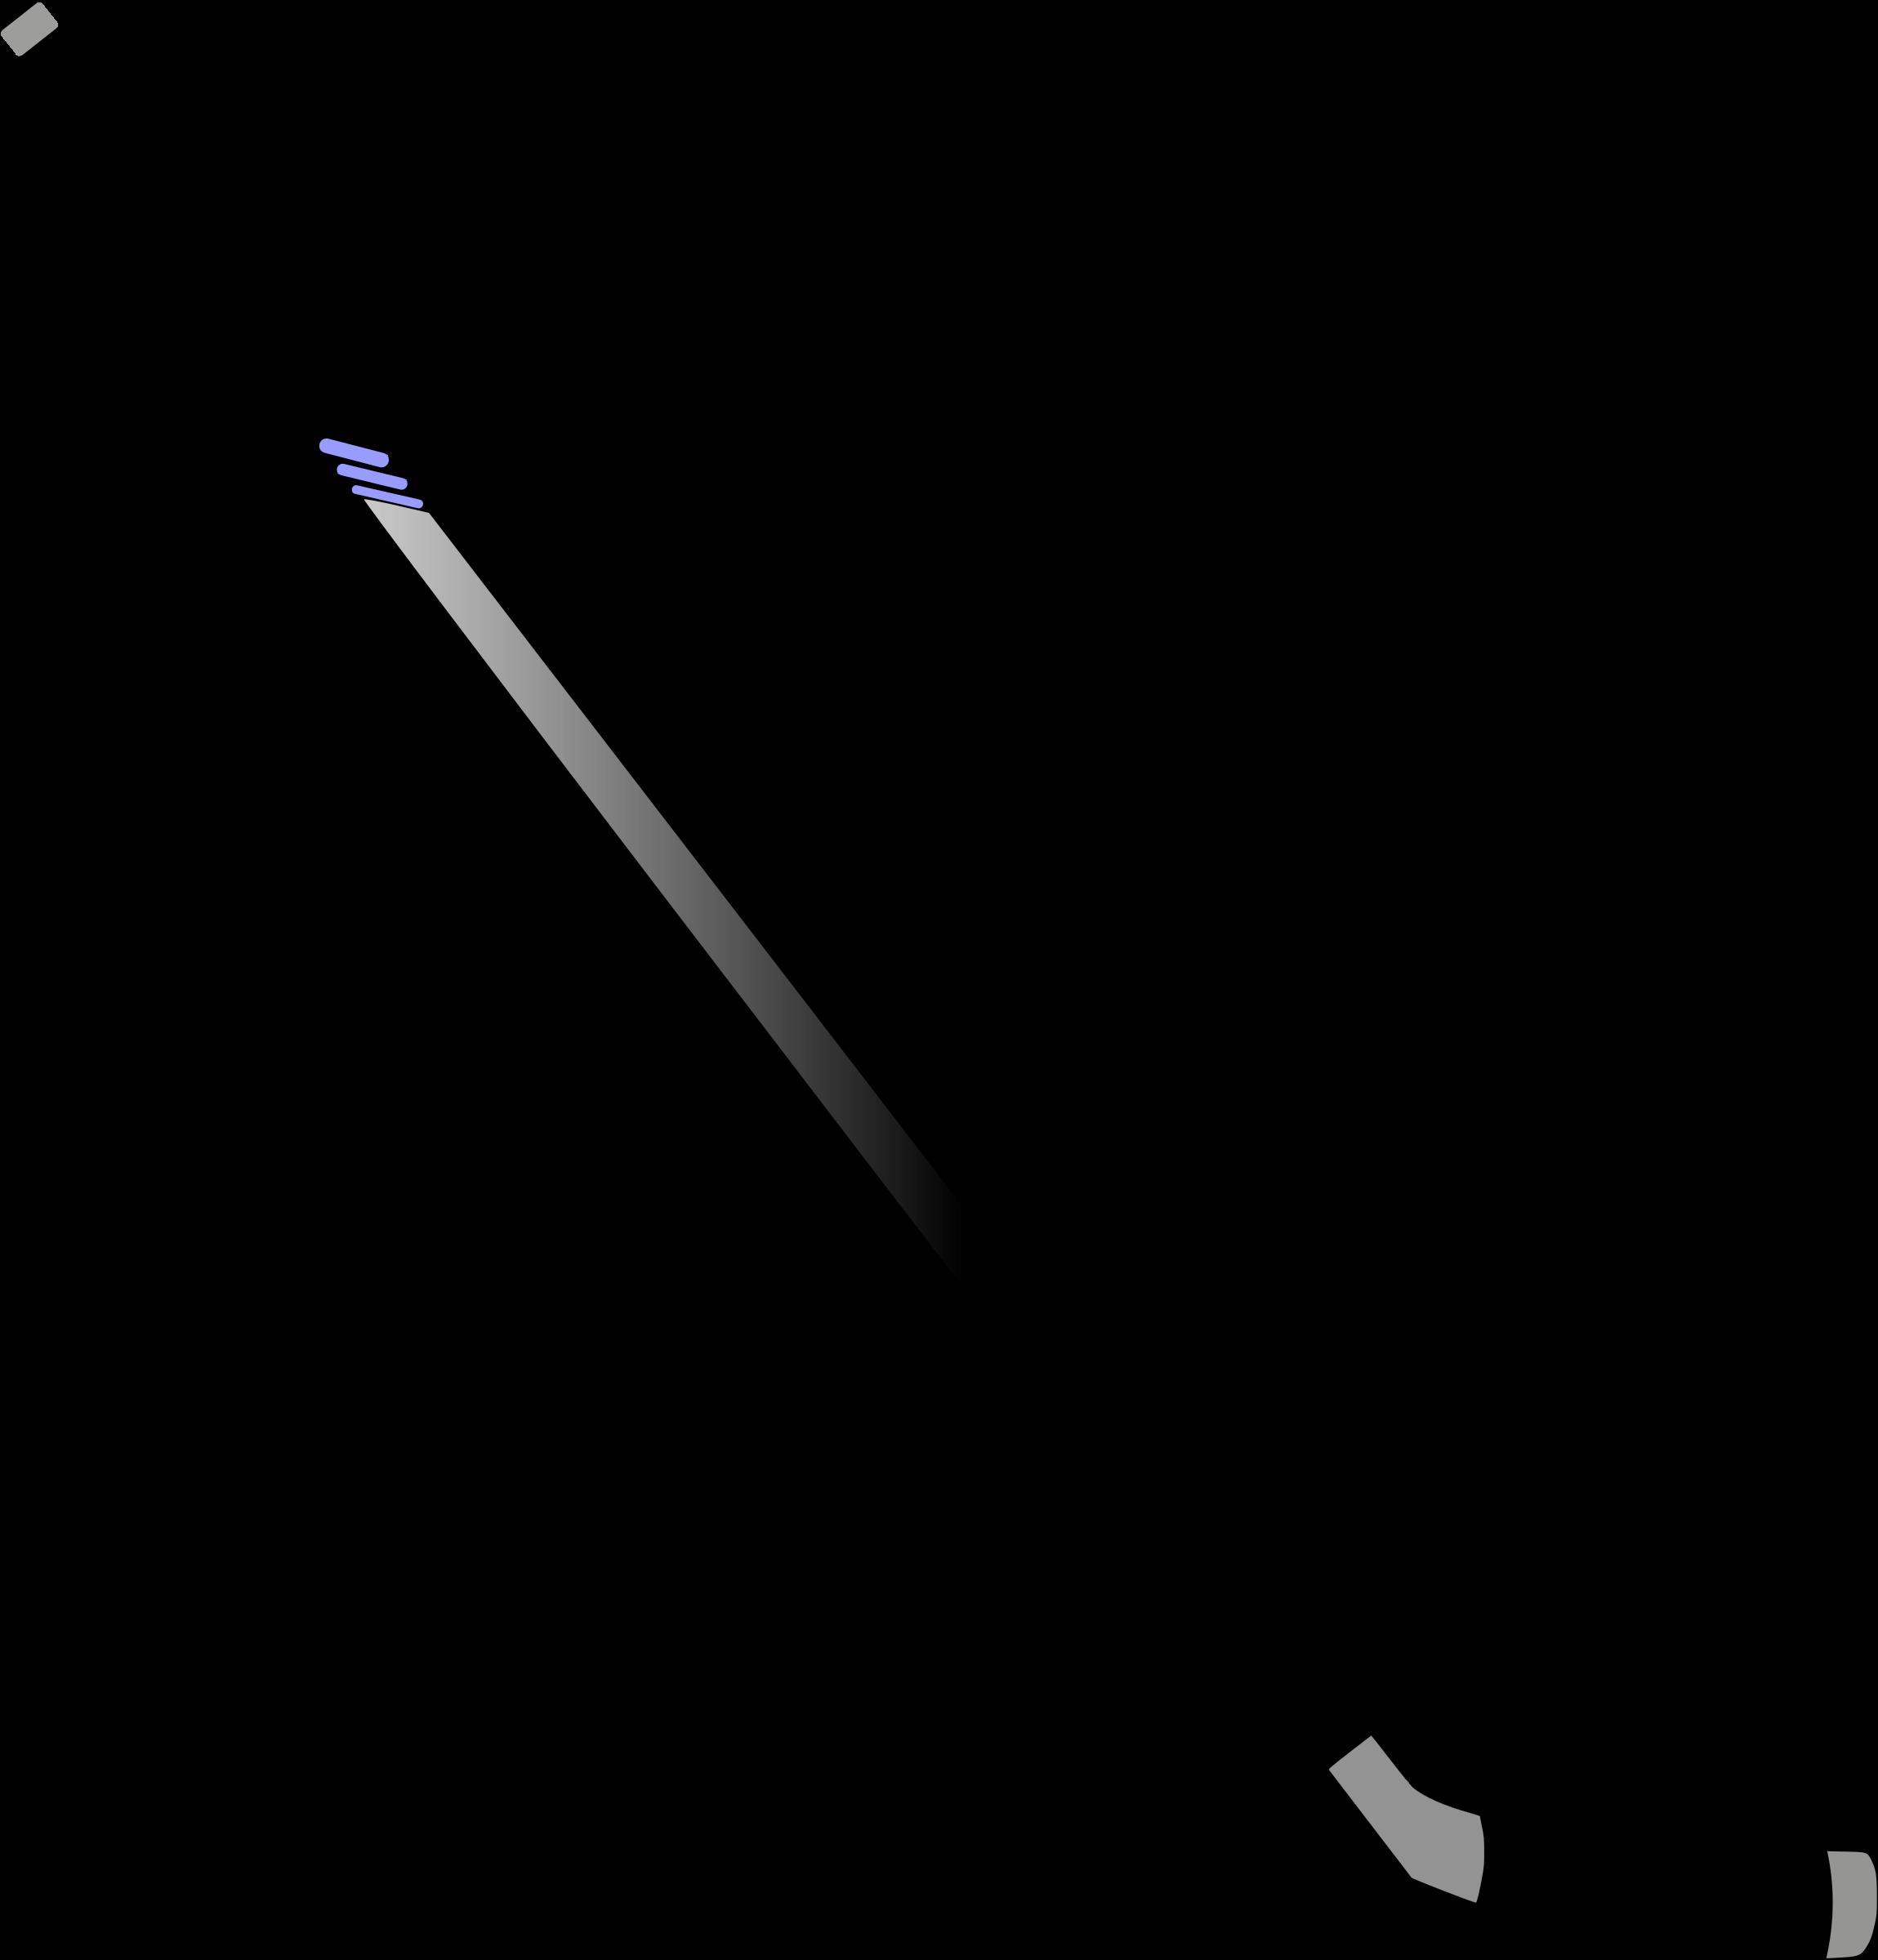 clipart hockey stick rh openclipart org hockey stick clipart vector hockey stick clipart vector